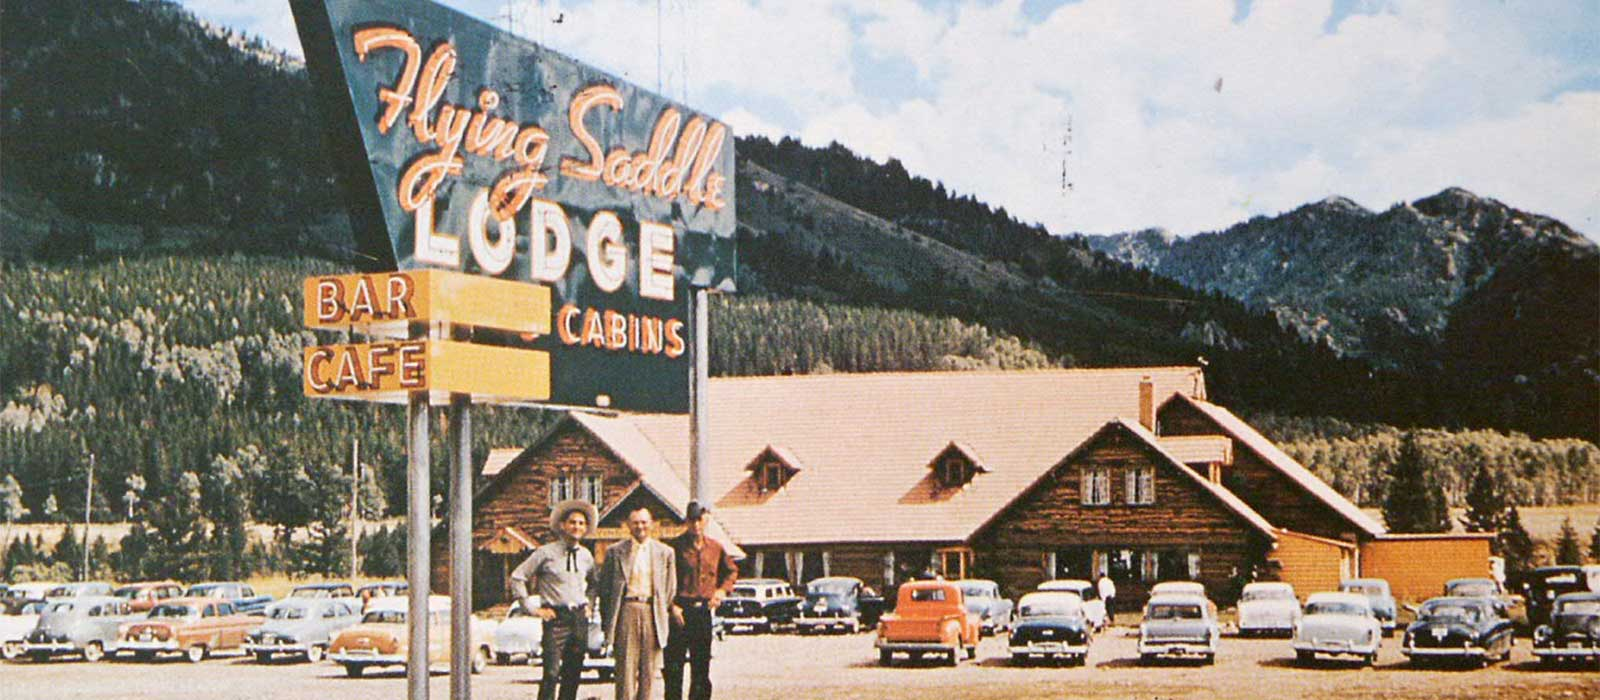 About Flying Saddle Resort Alpine Wyoming Hotel